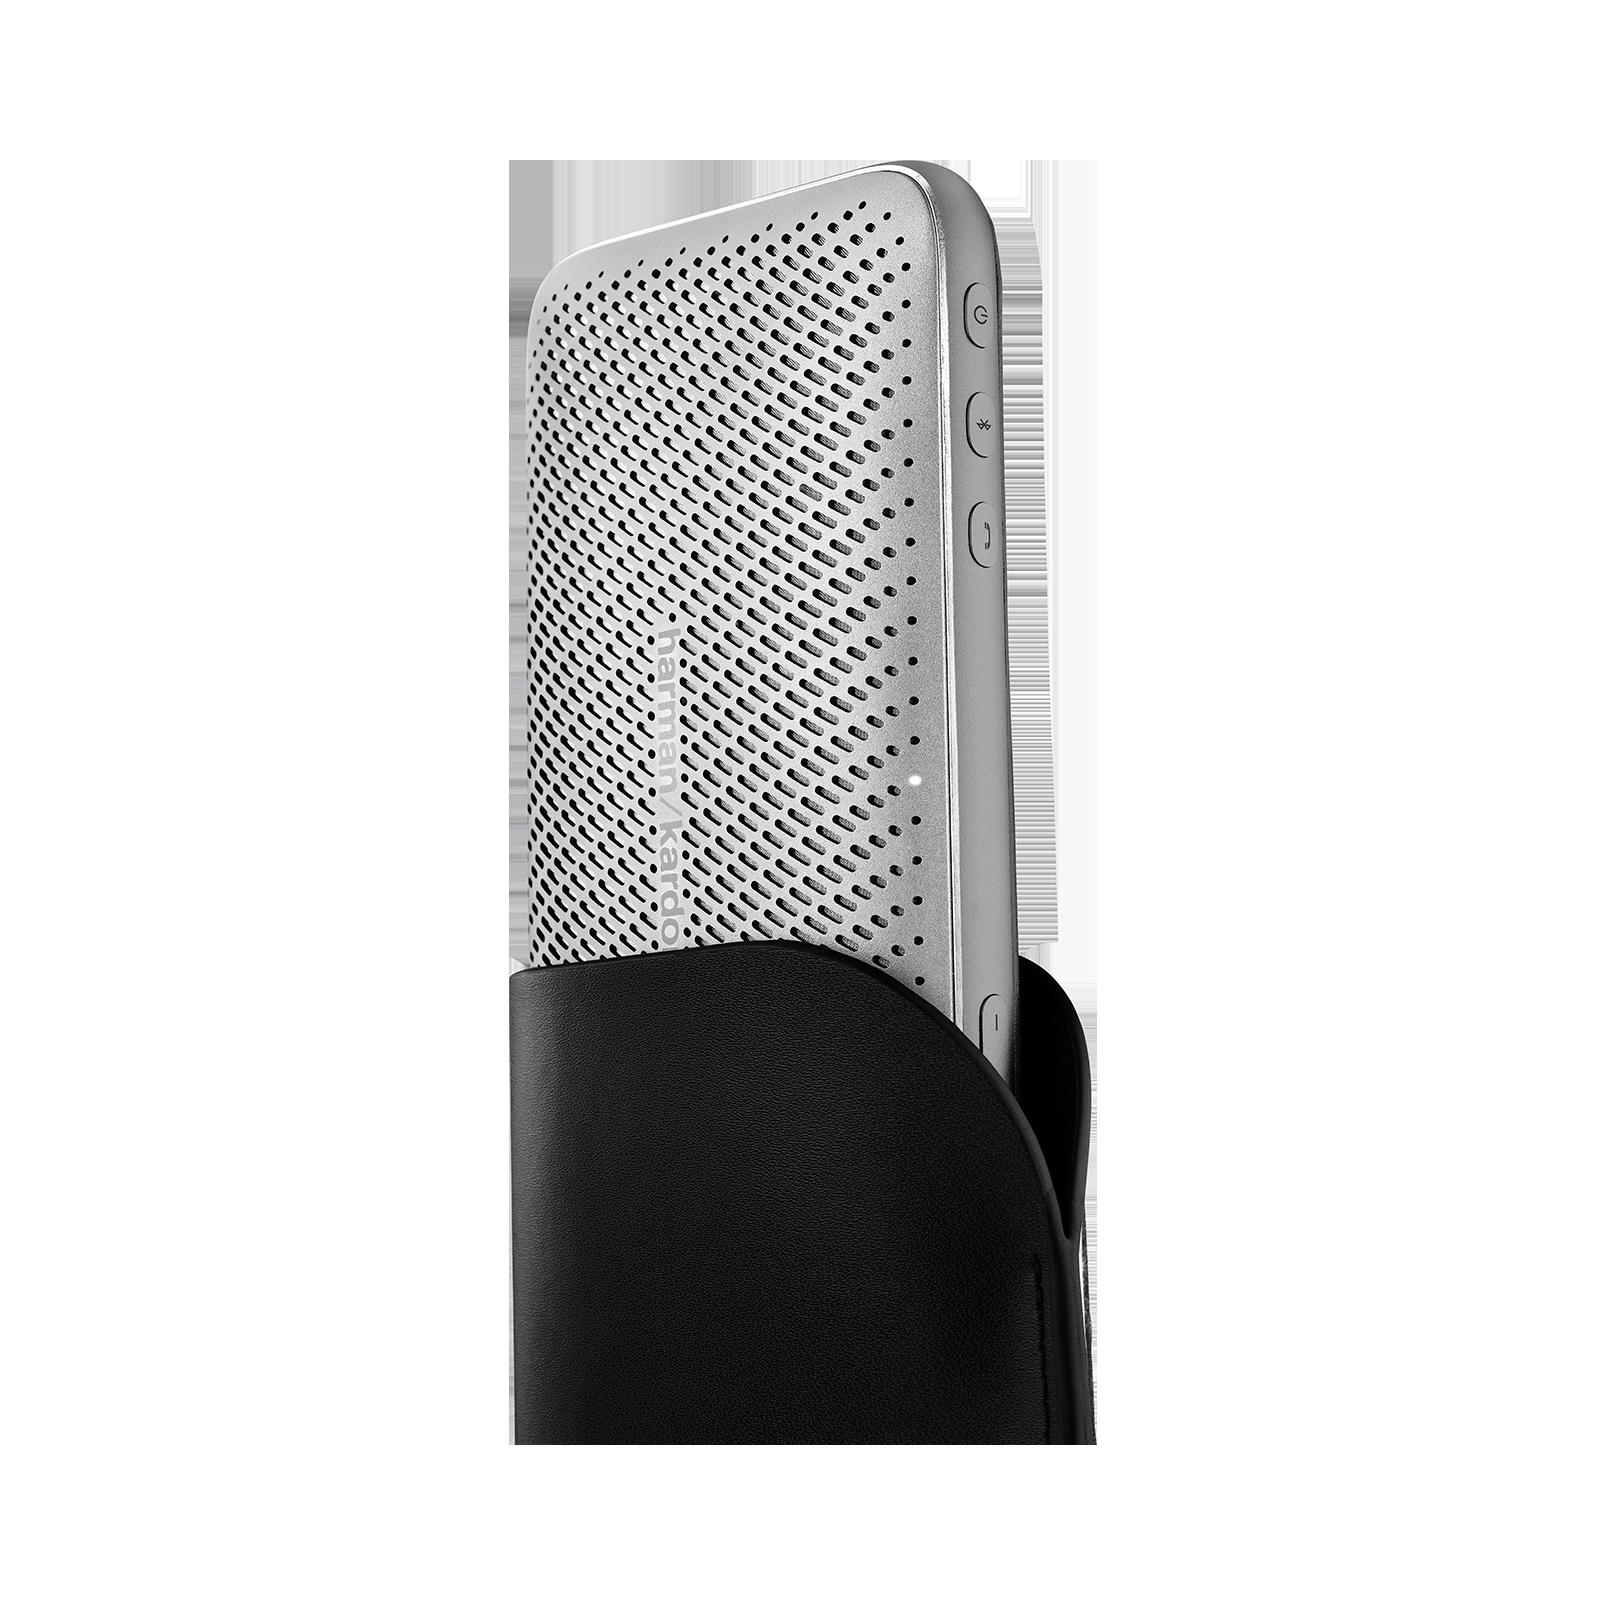 Harman Kardon Esquire Mini 2 - Silver - Ultra-slim and portable premium Bluetooth Speaker - Detailshot 1